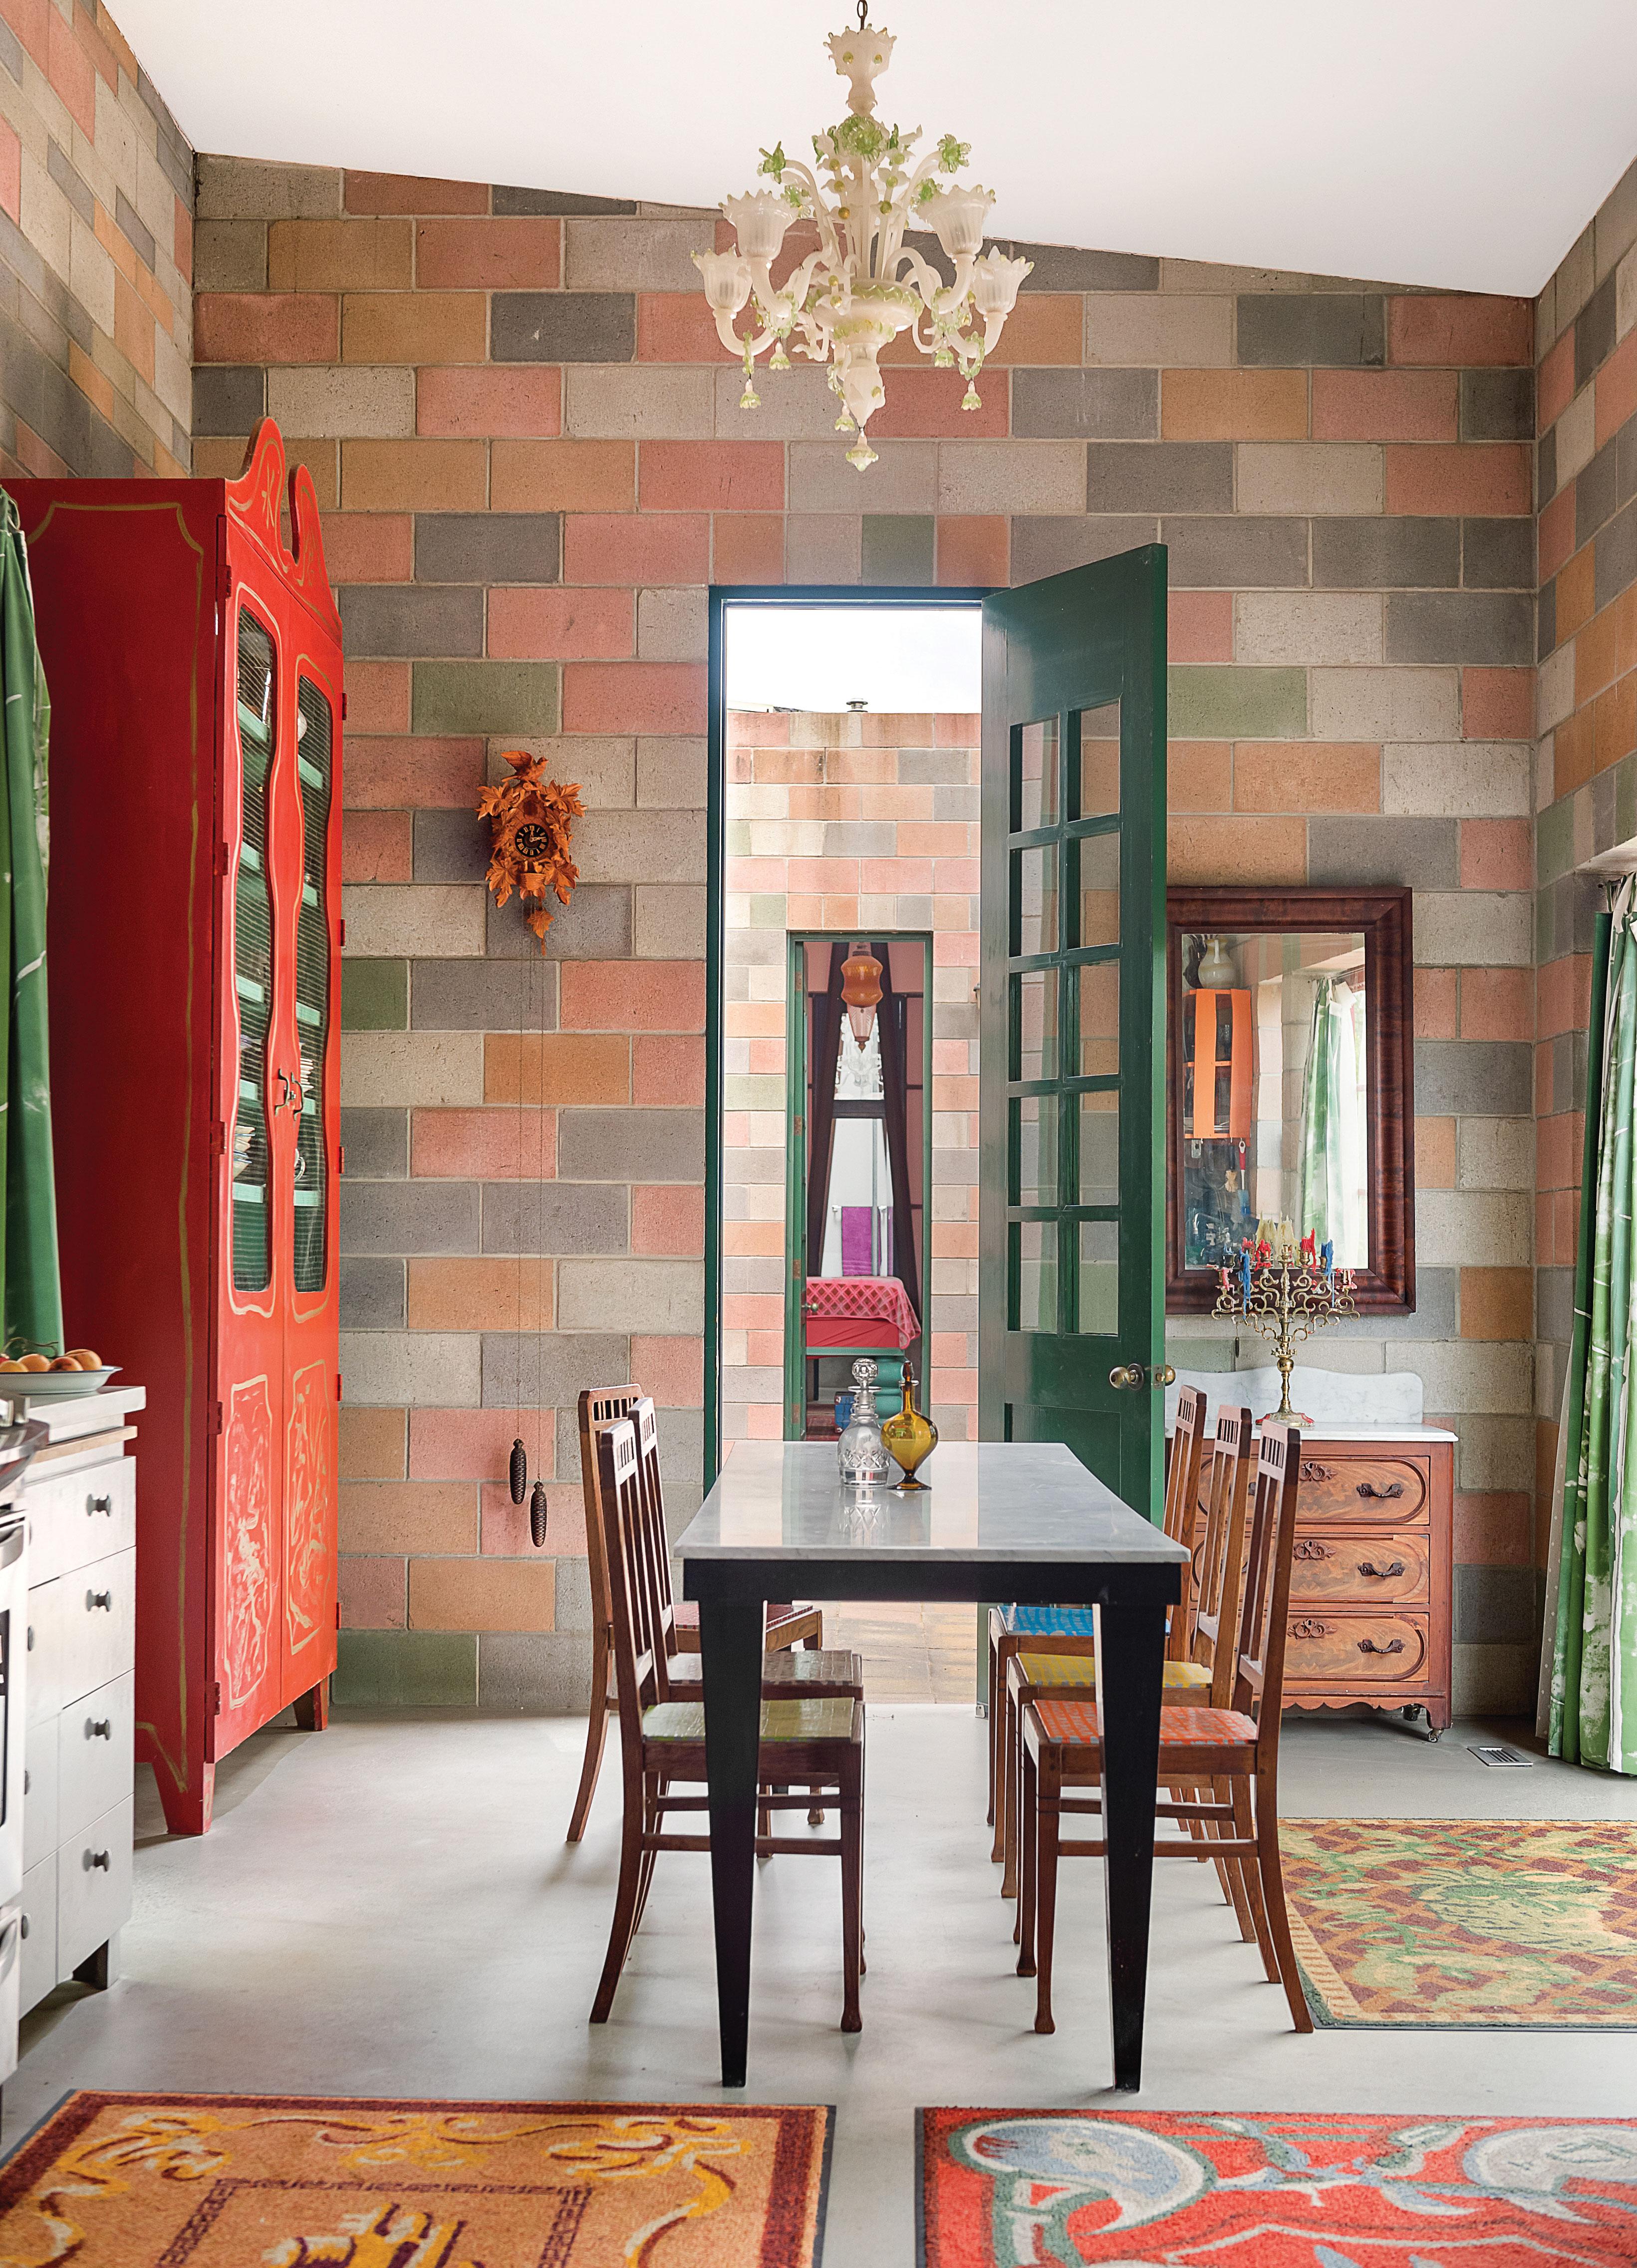 jean lowe and kim macconnel artists art san diego home kitchen